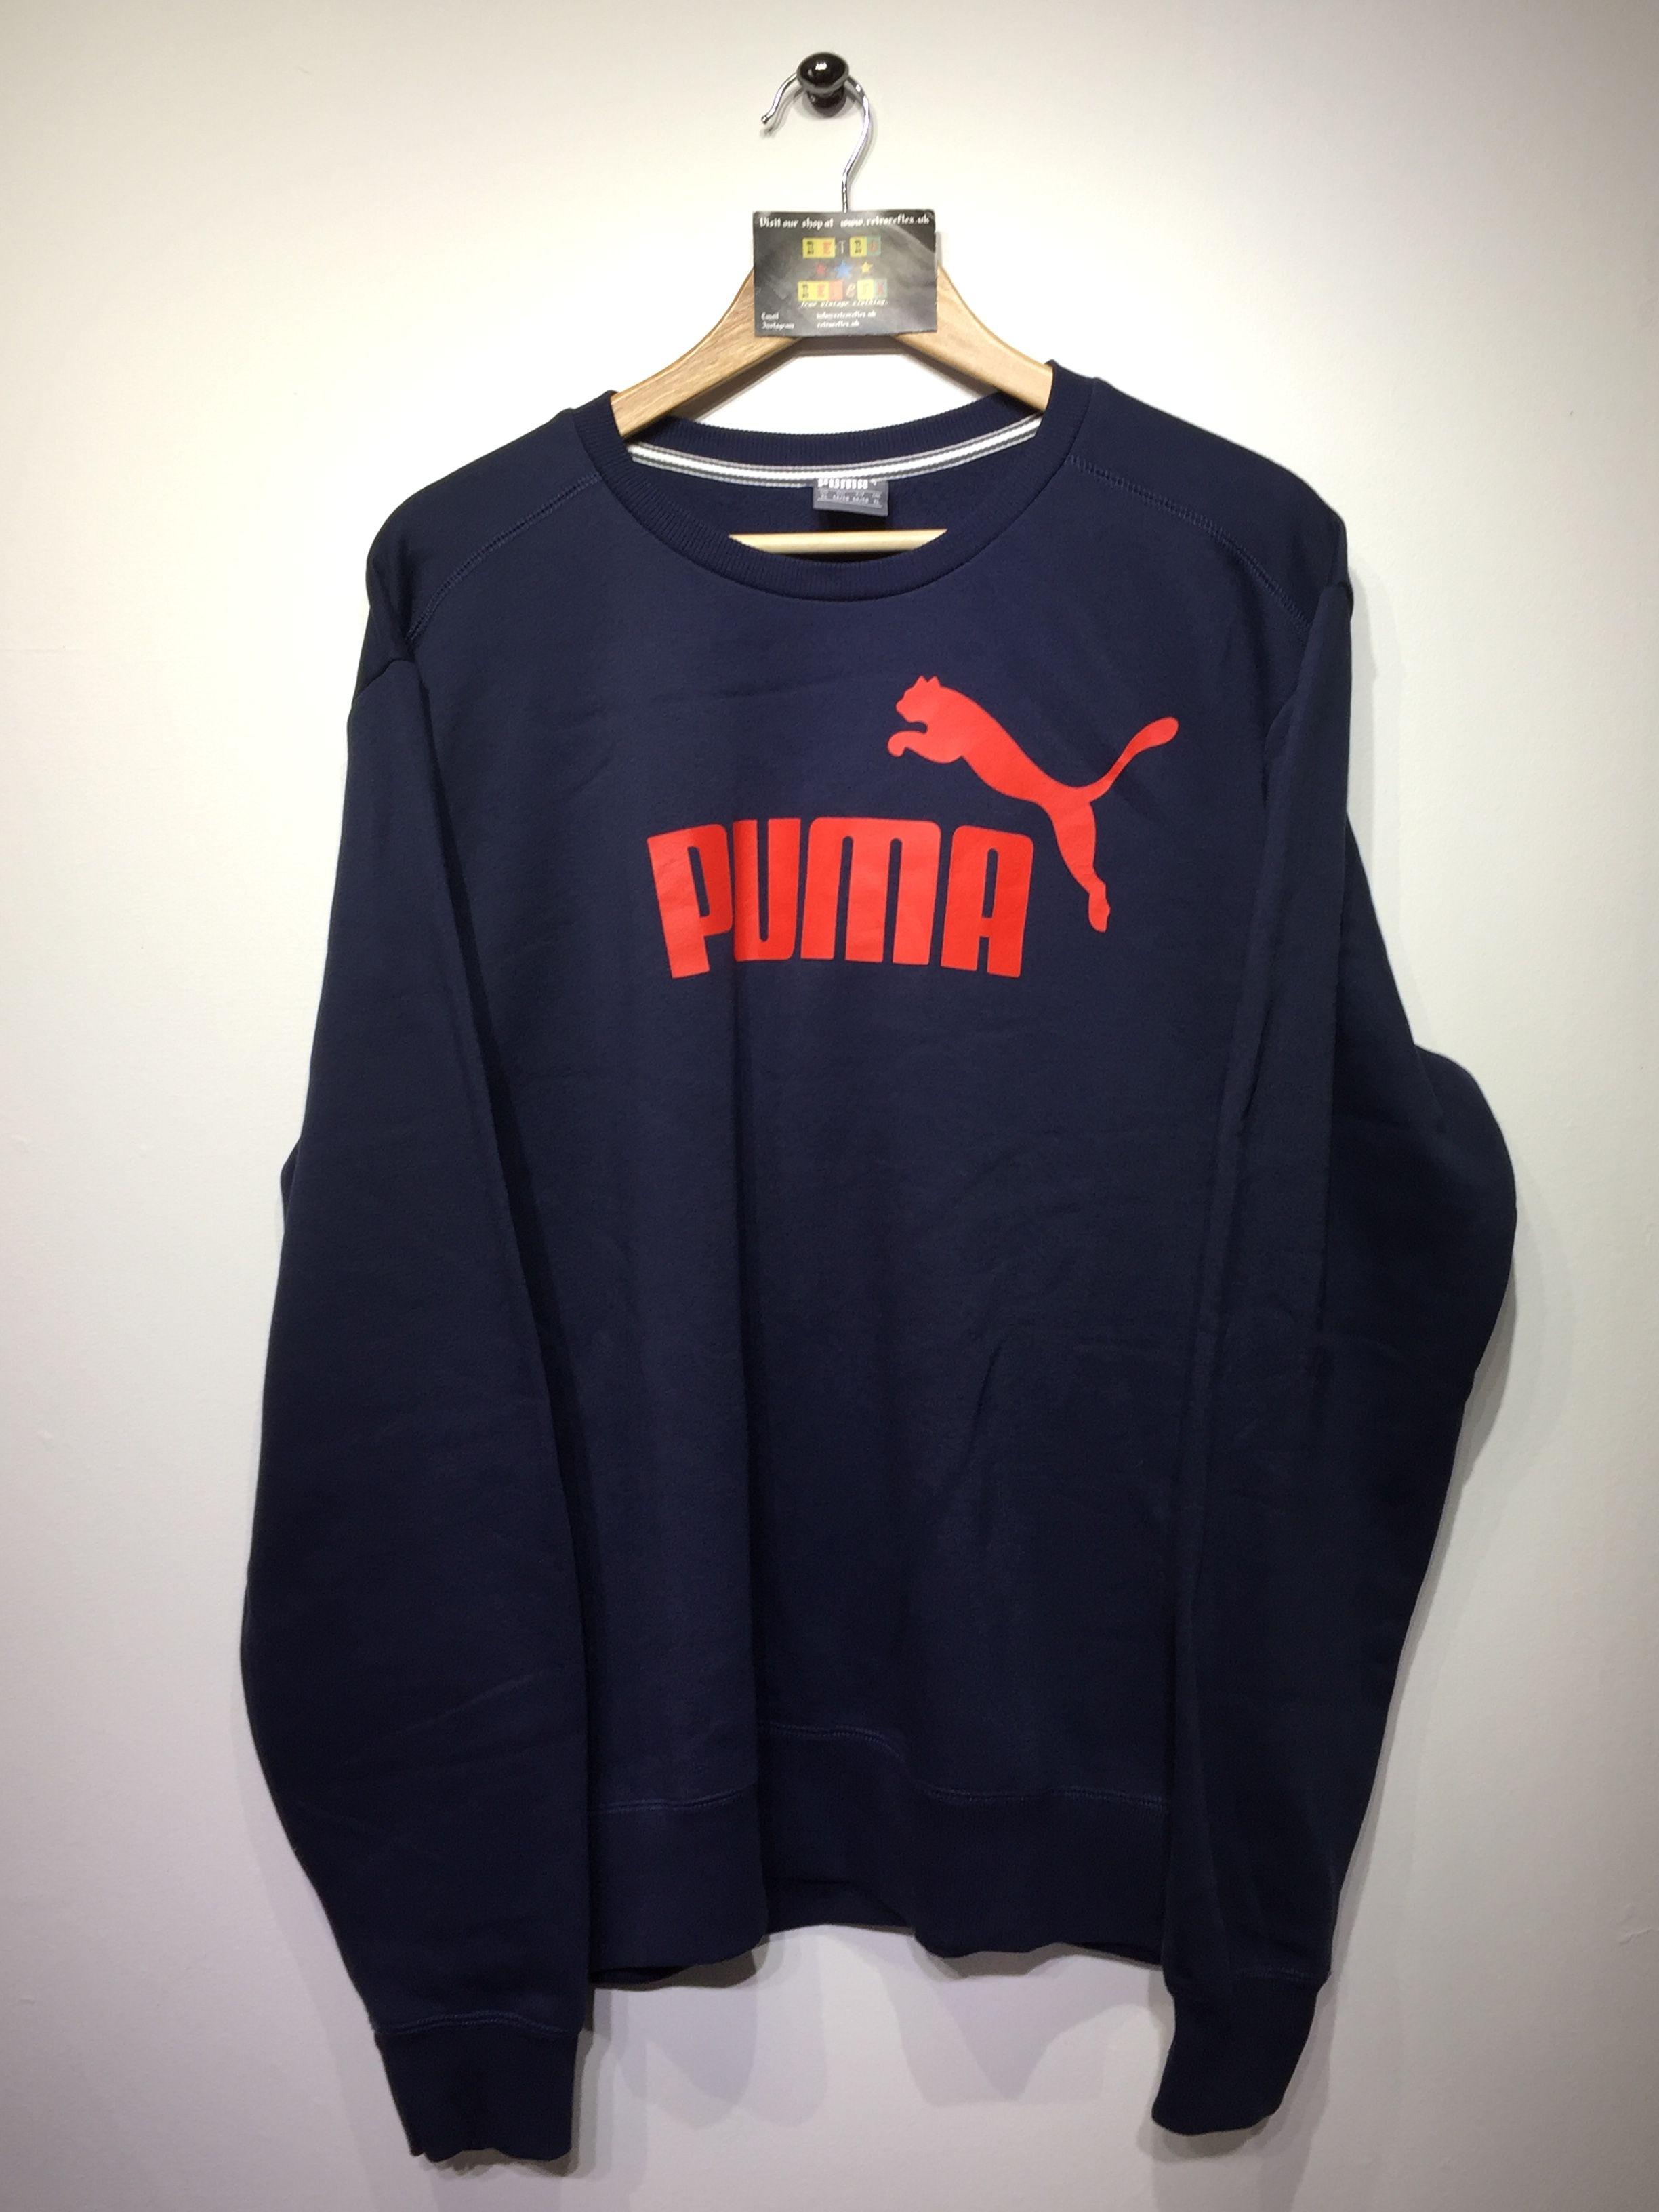 bb3b3f7835bc Puma Sweatshirt size X Large (but Fits Oversized) £32 Website ...